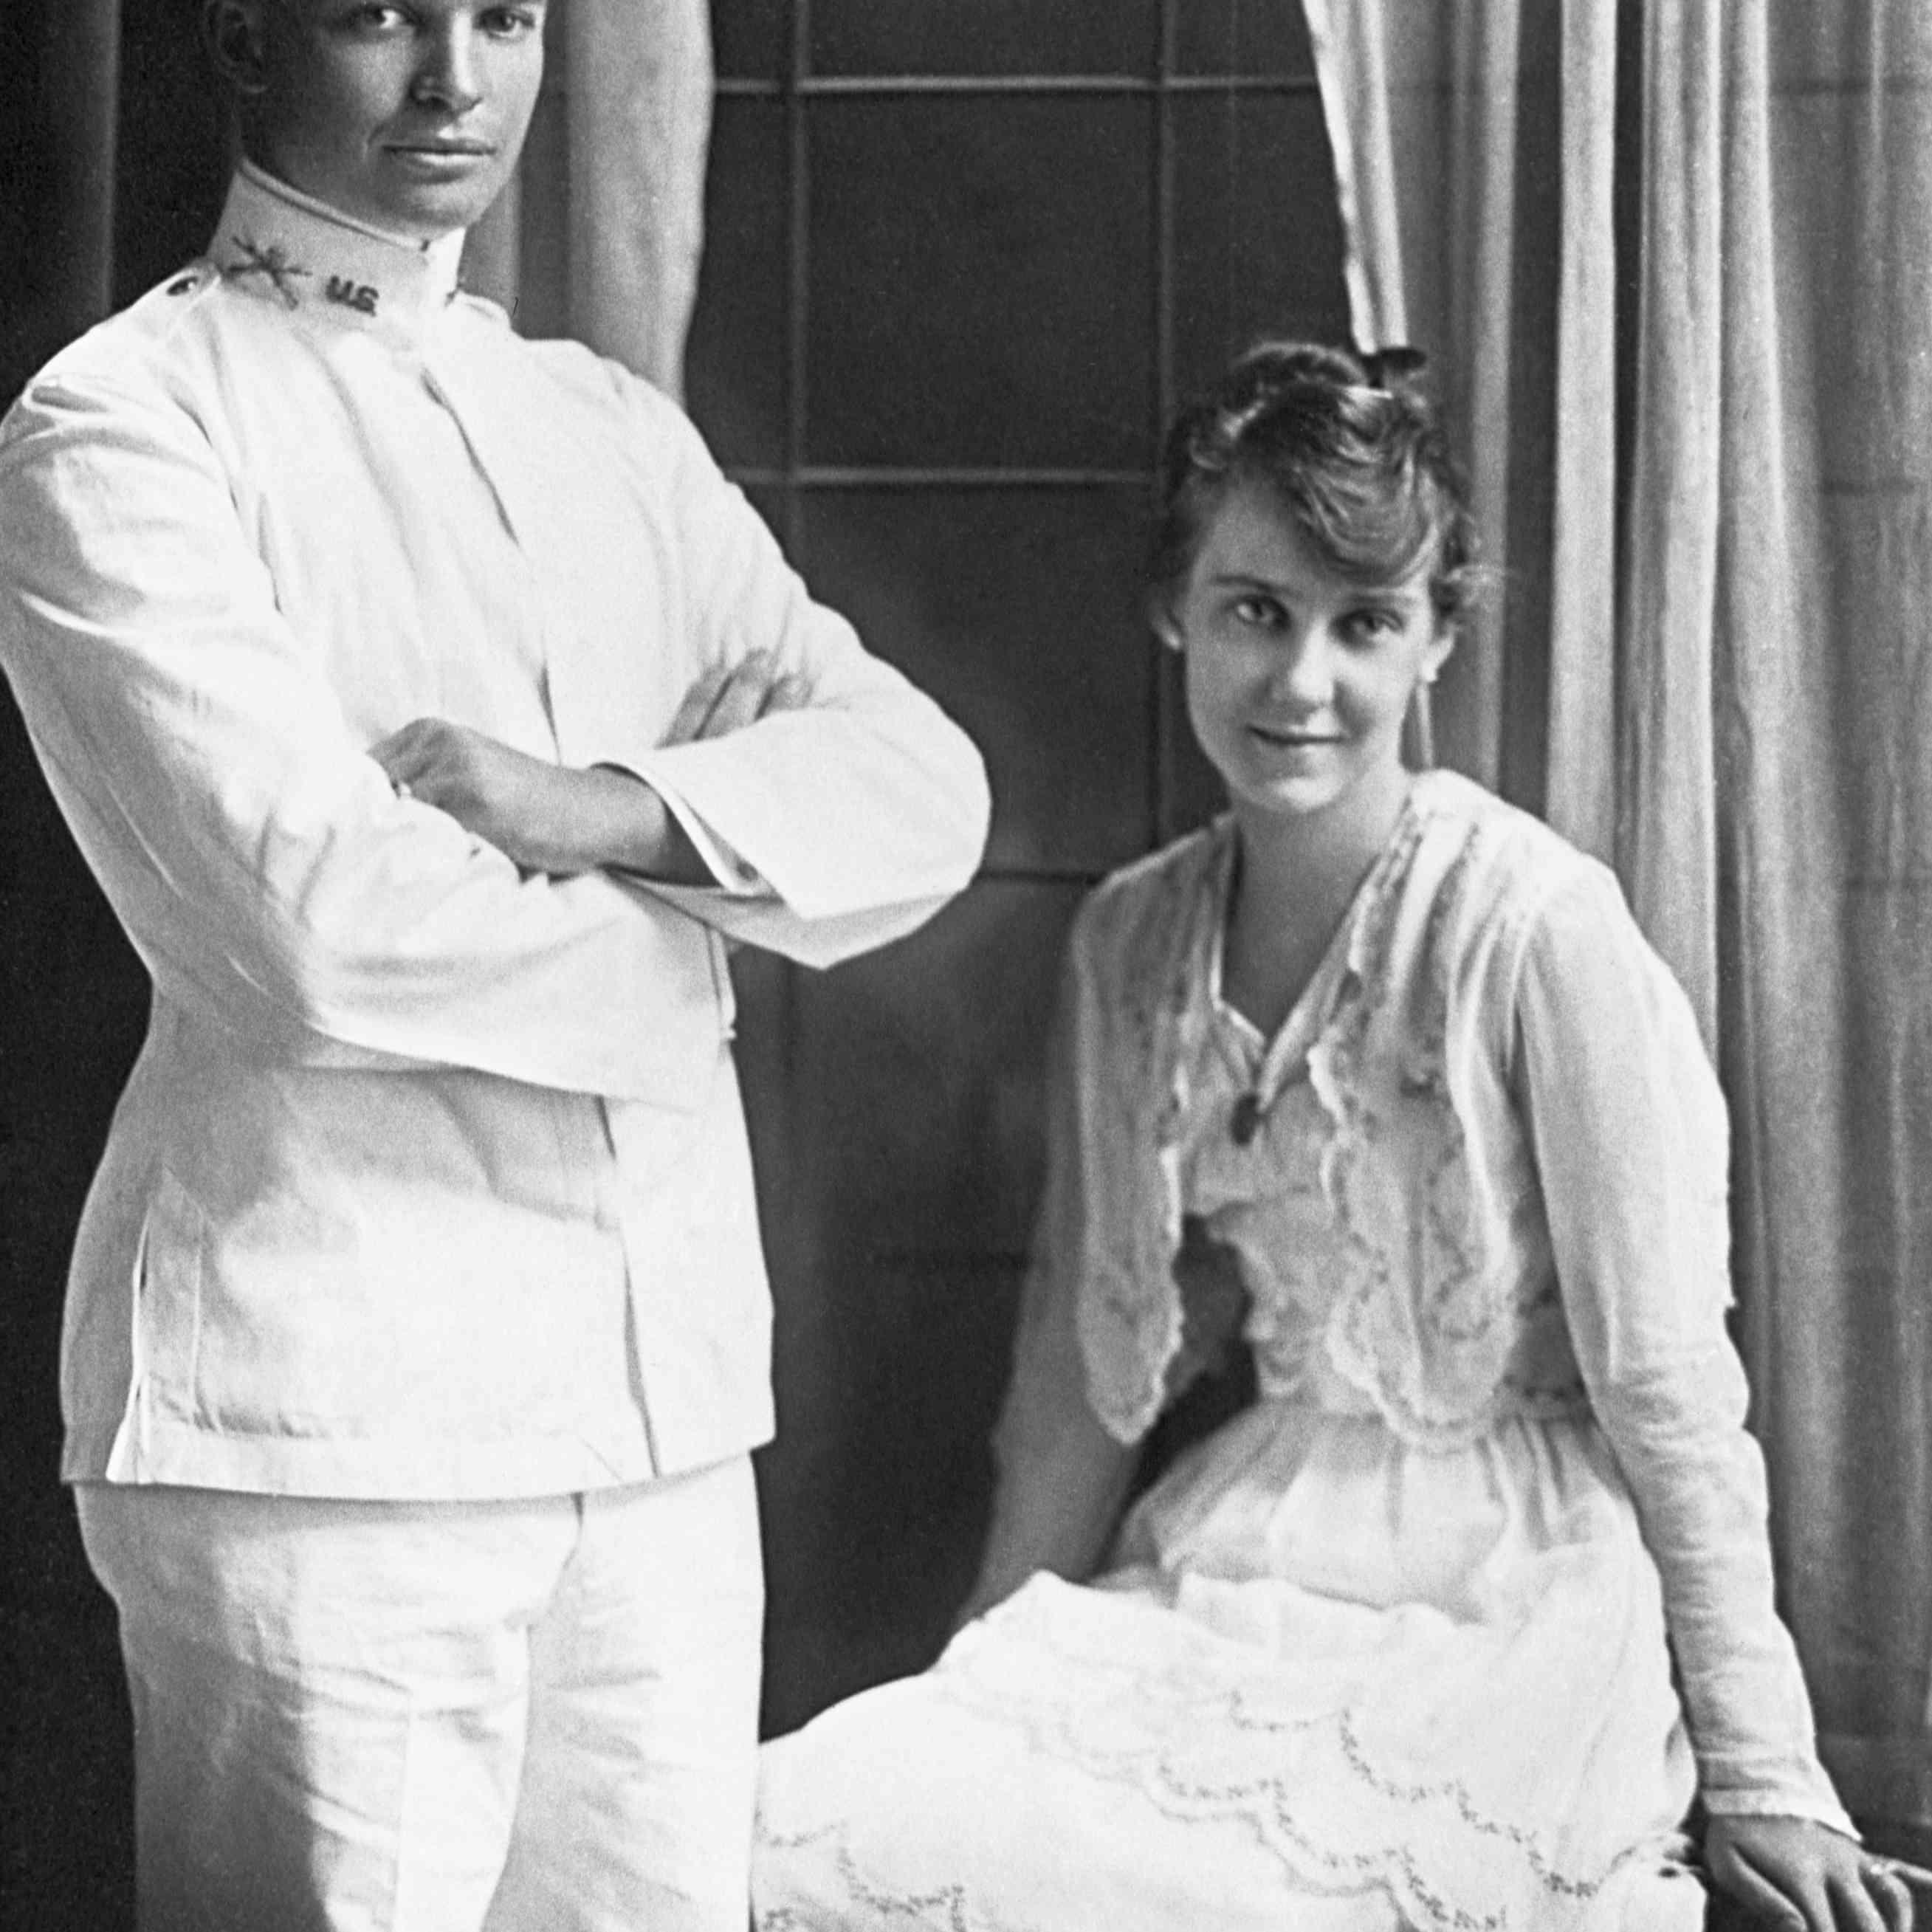 Mamie and Dwight Eisenhower